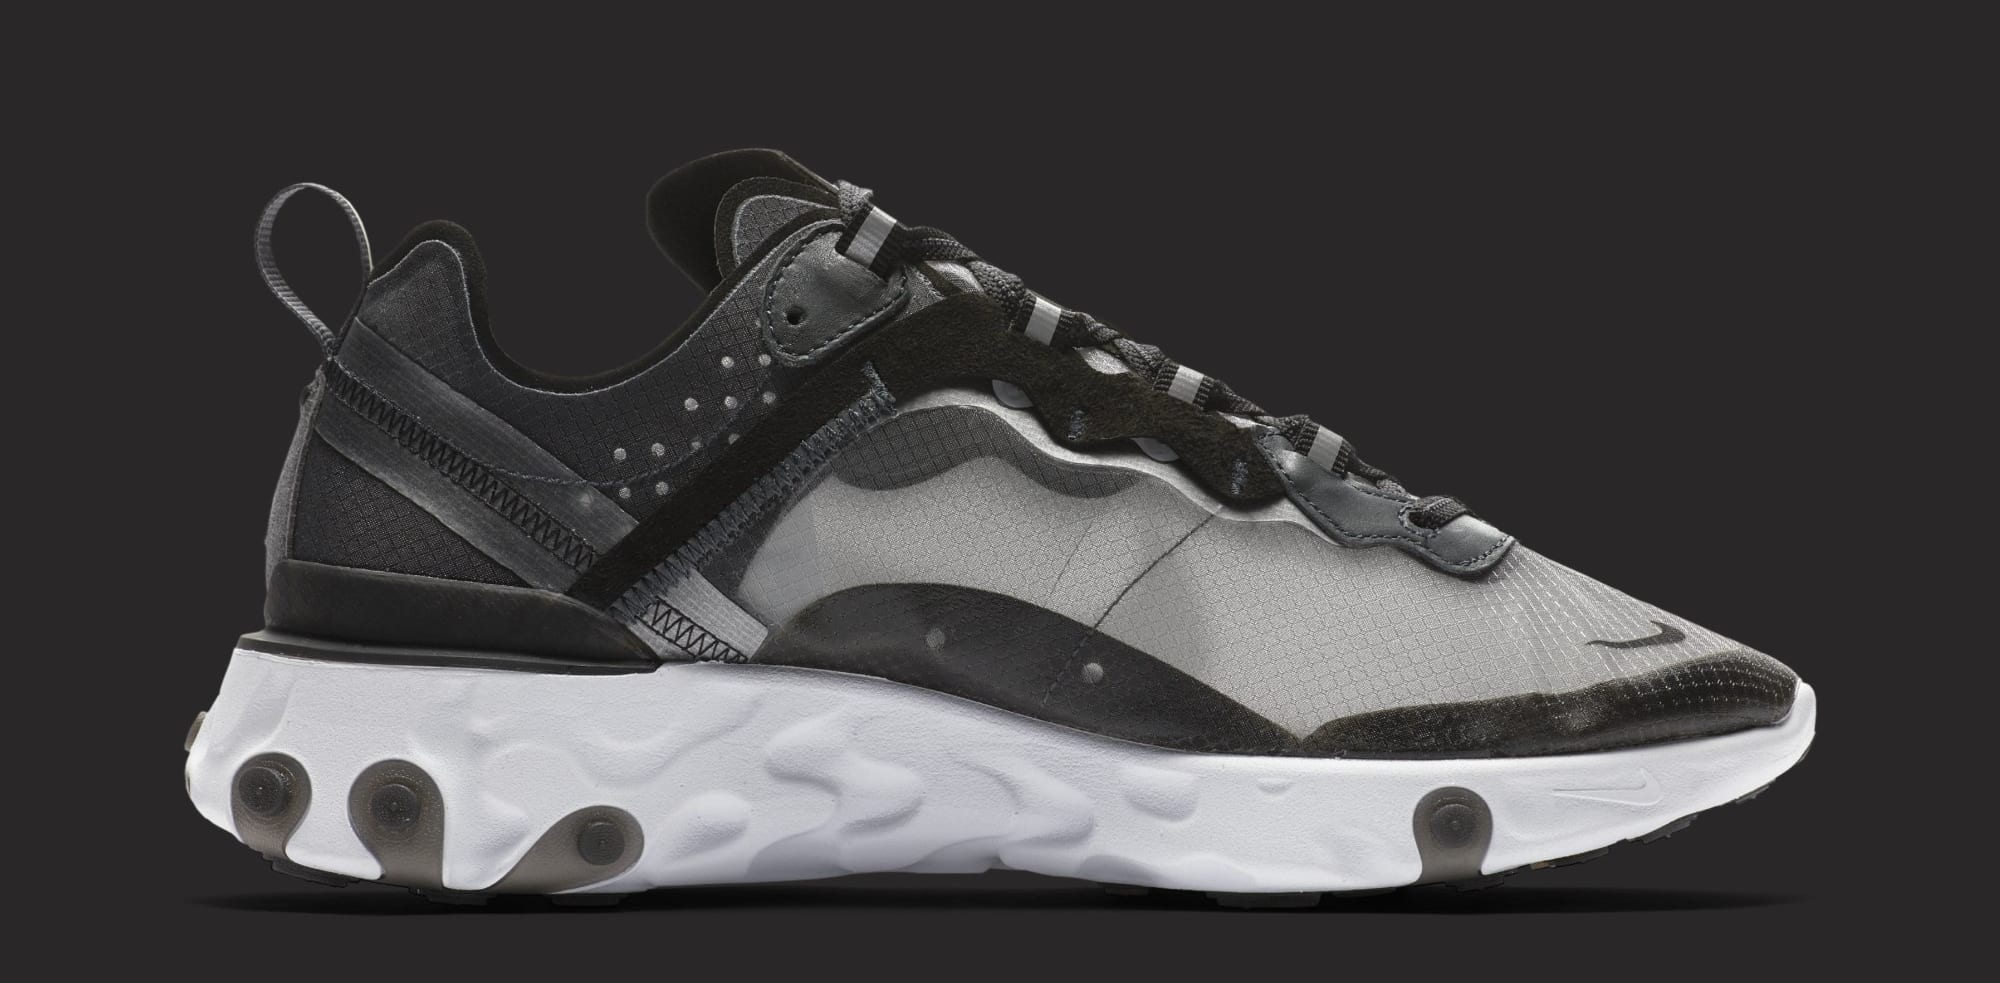 Nike React Element 87 'Anthracite/Black/White' AQ1090-001 (Medial)